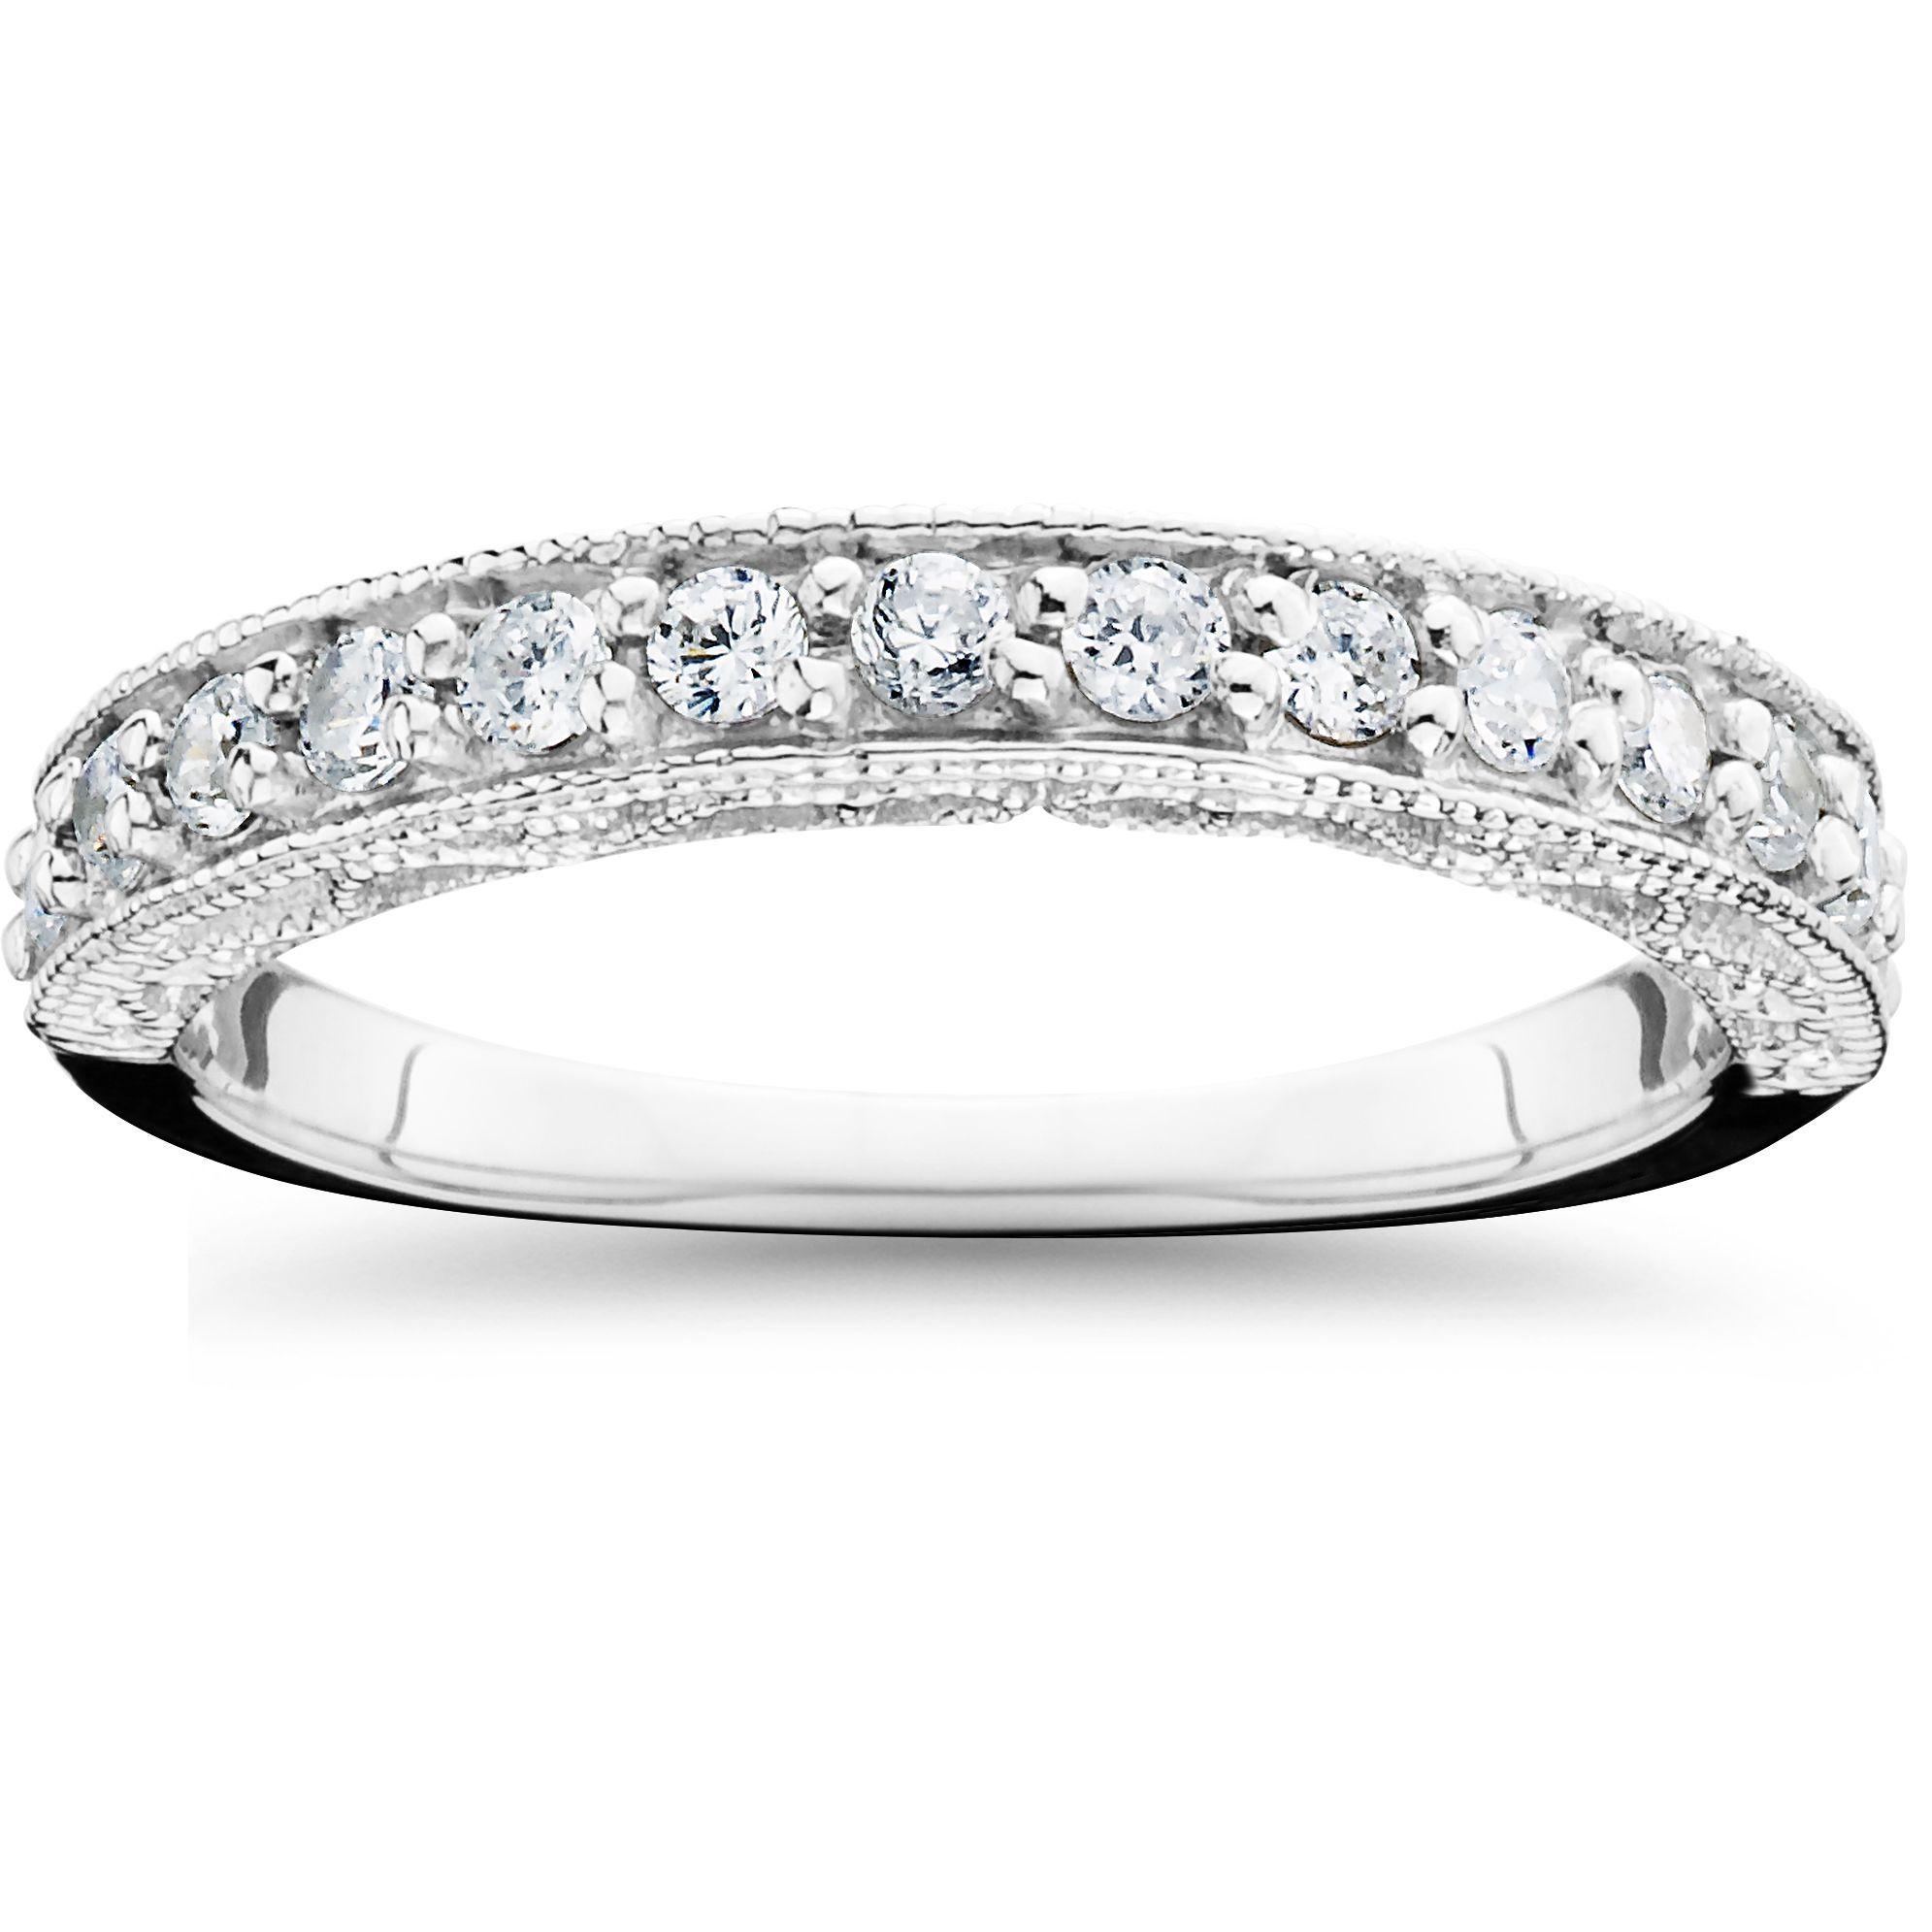 14k White Gold 1 2ct TDW Diamond Wedding Ring I J I2 I3 Size 9